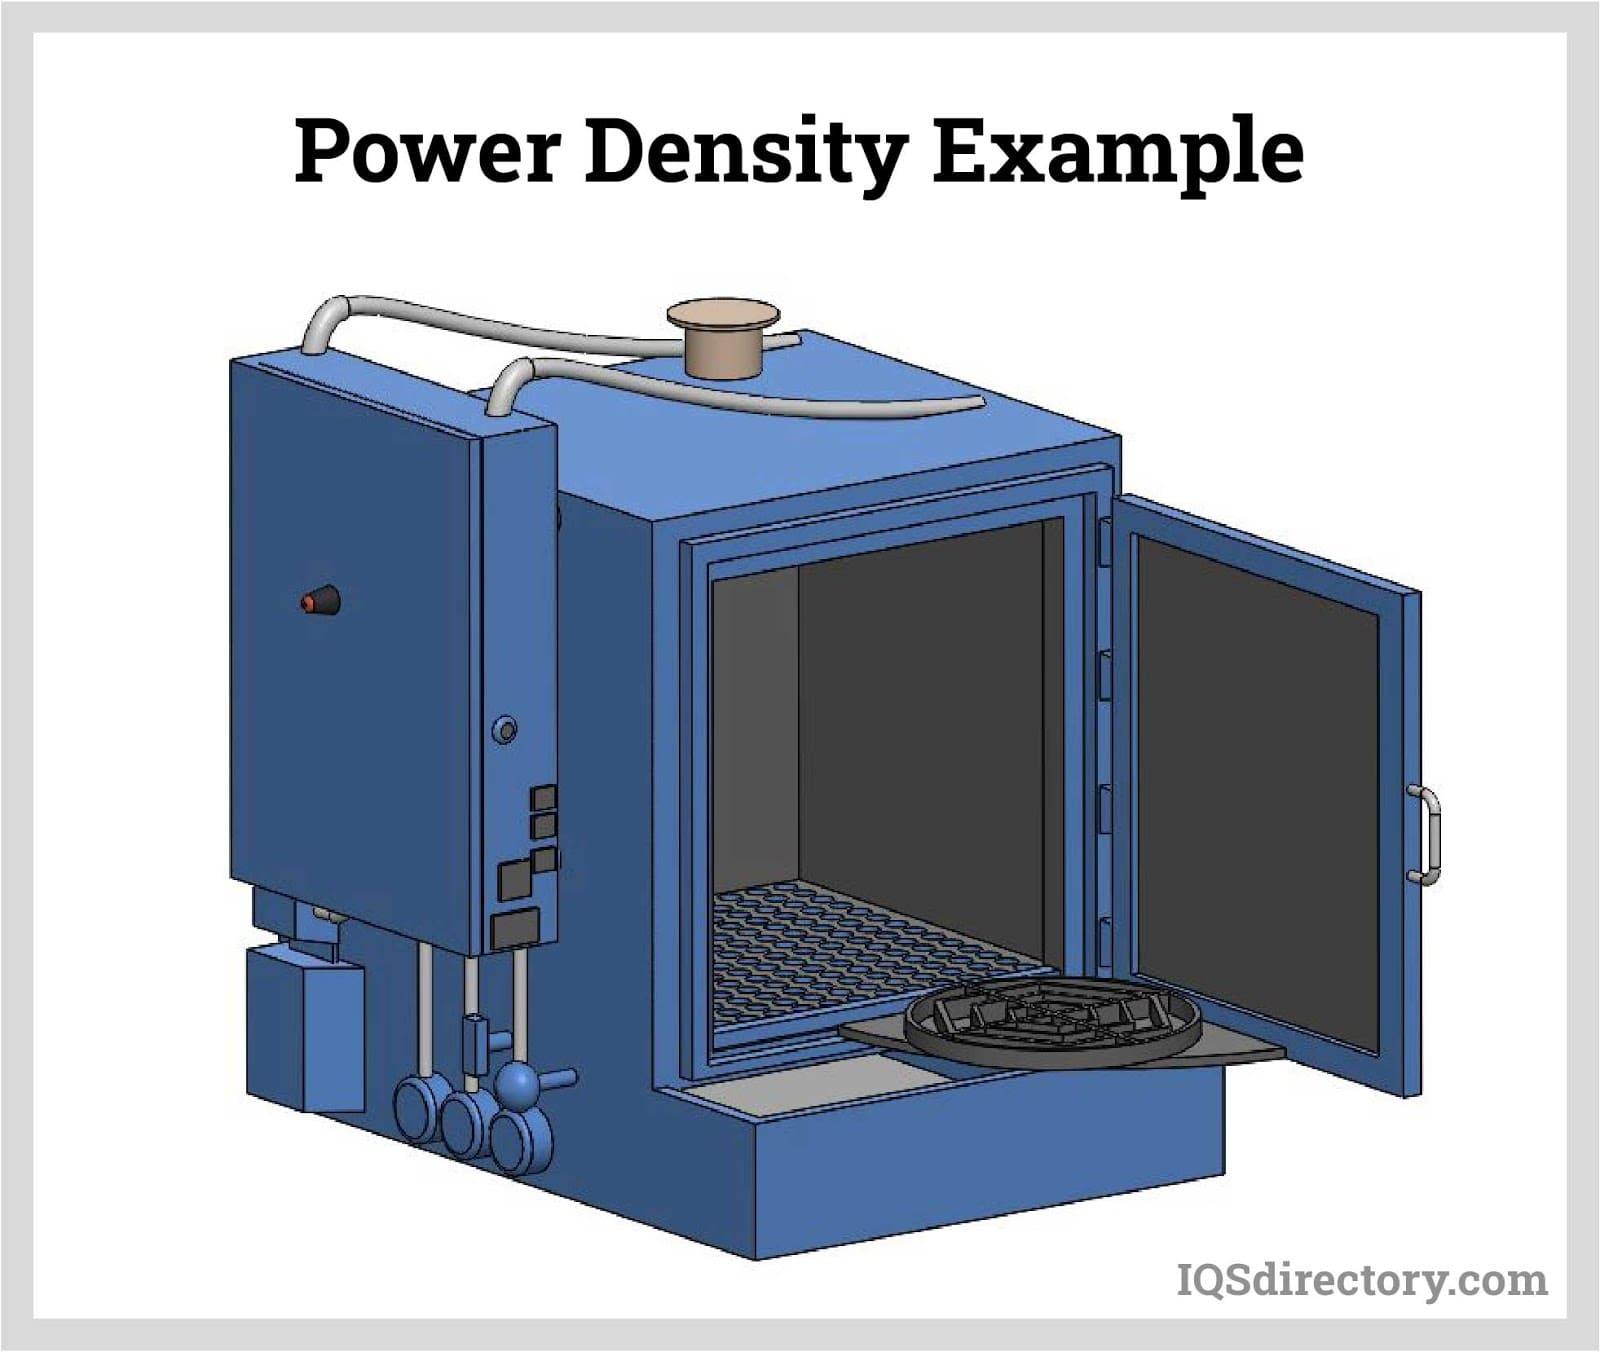 Power Density Example